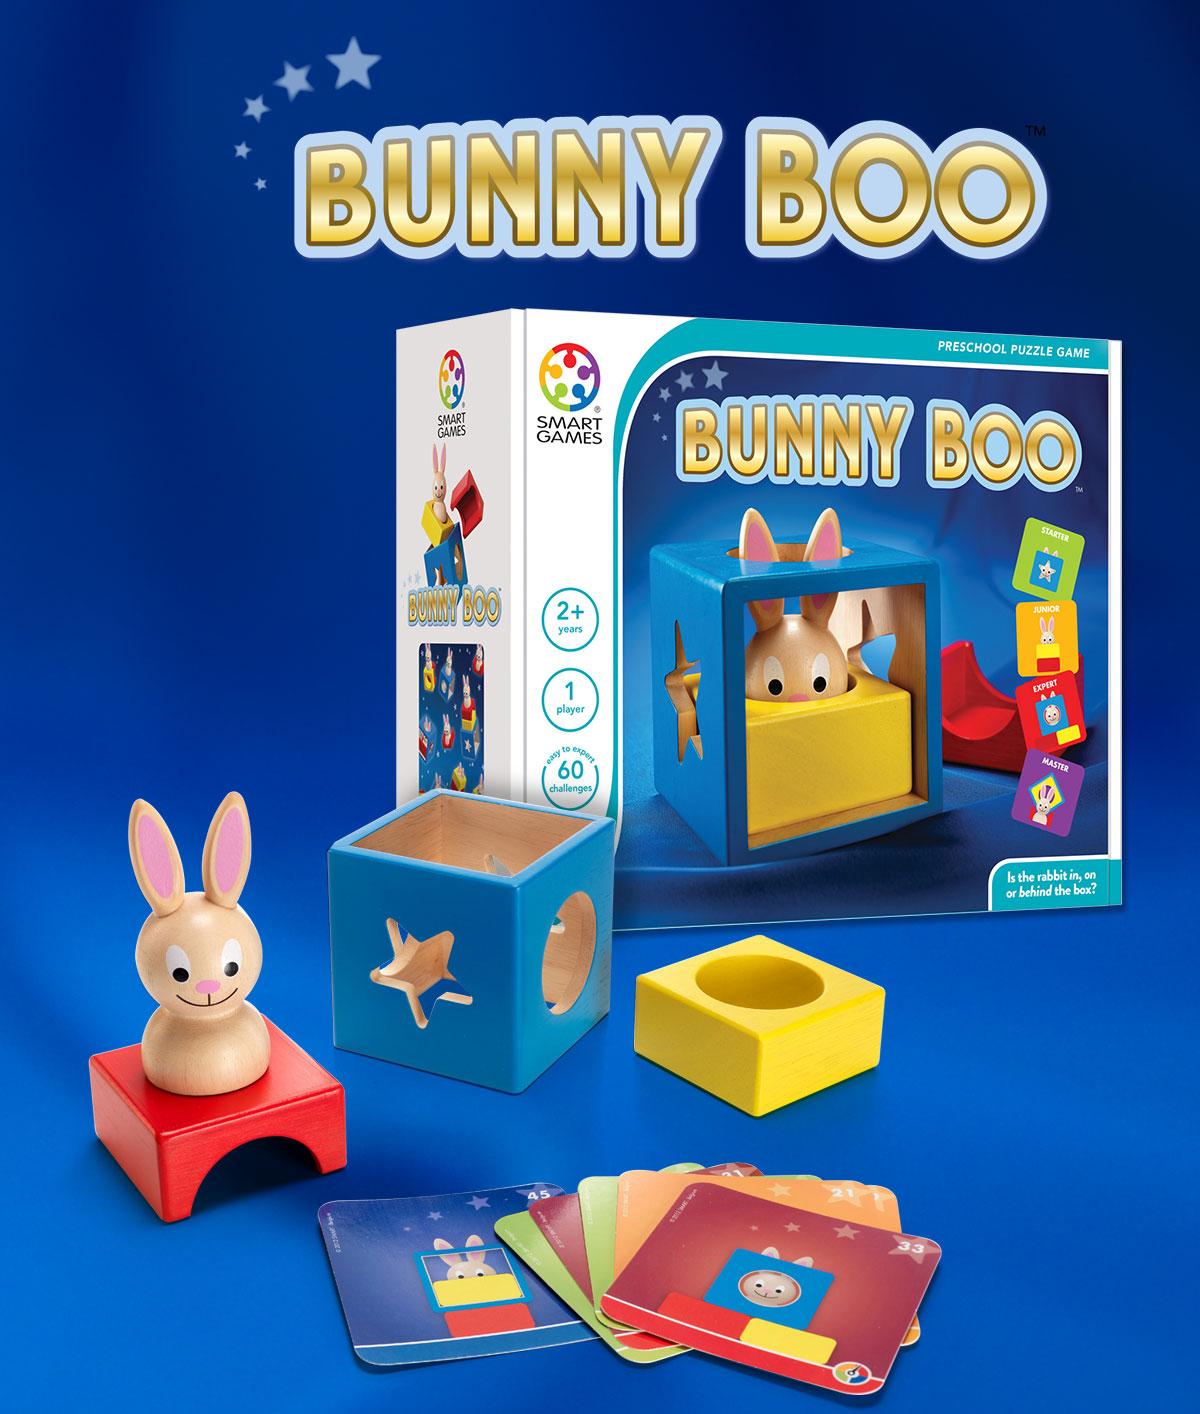 Bunny Boo